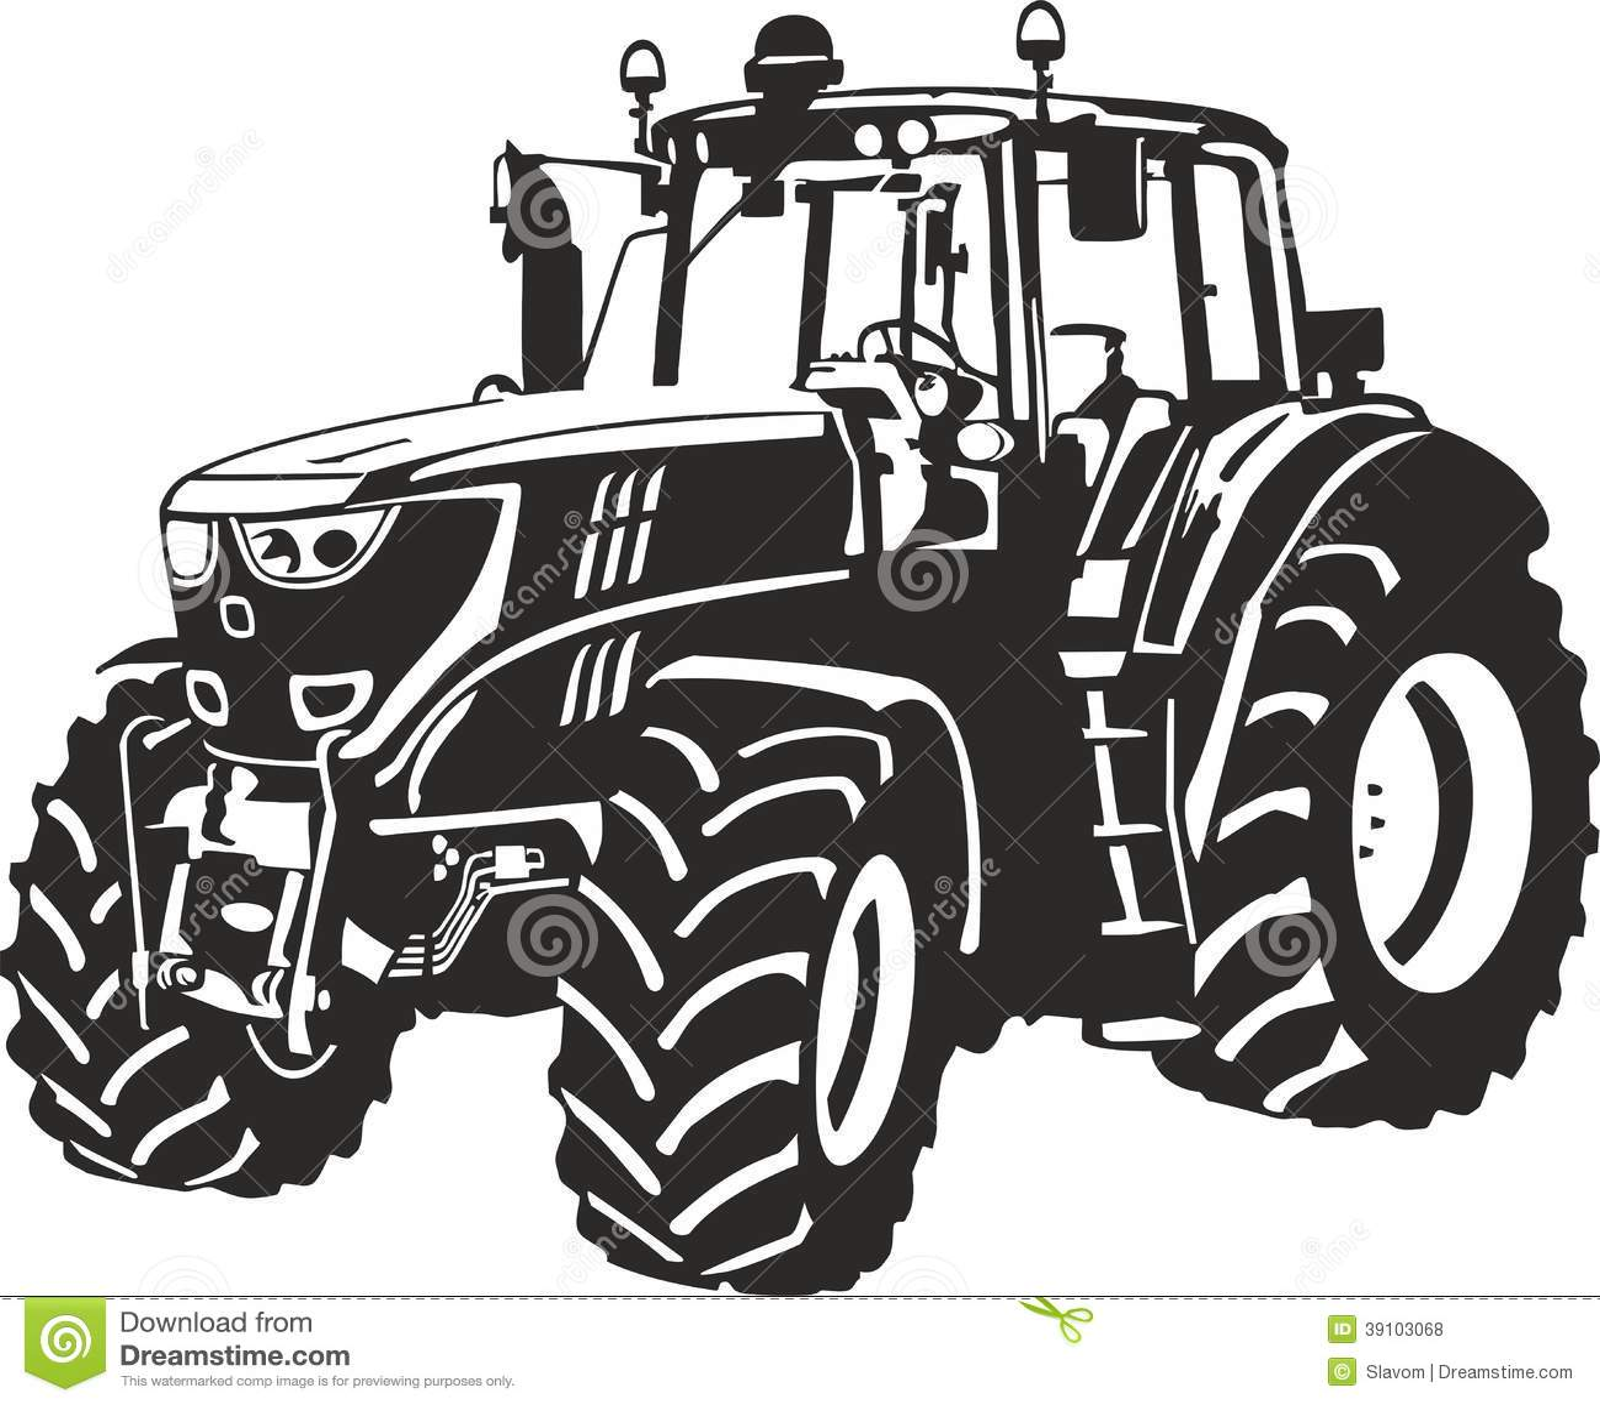 tractor stock photo image 39103068. Black Bedroom Furniture Sets. Home Design Ideas